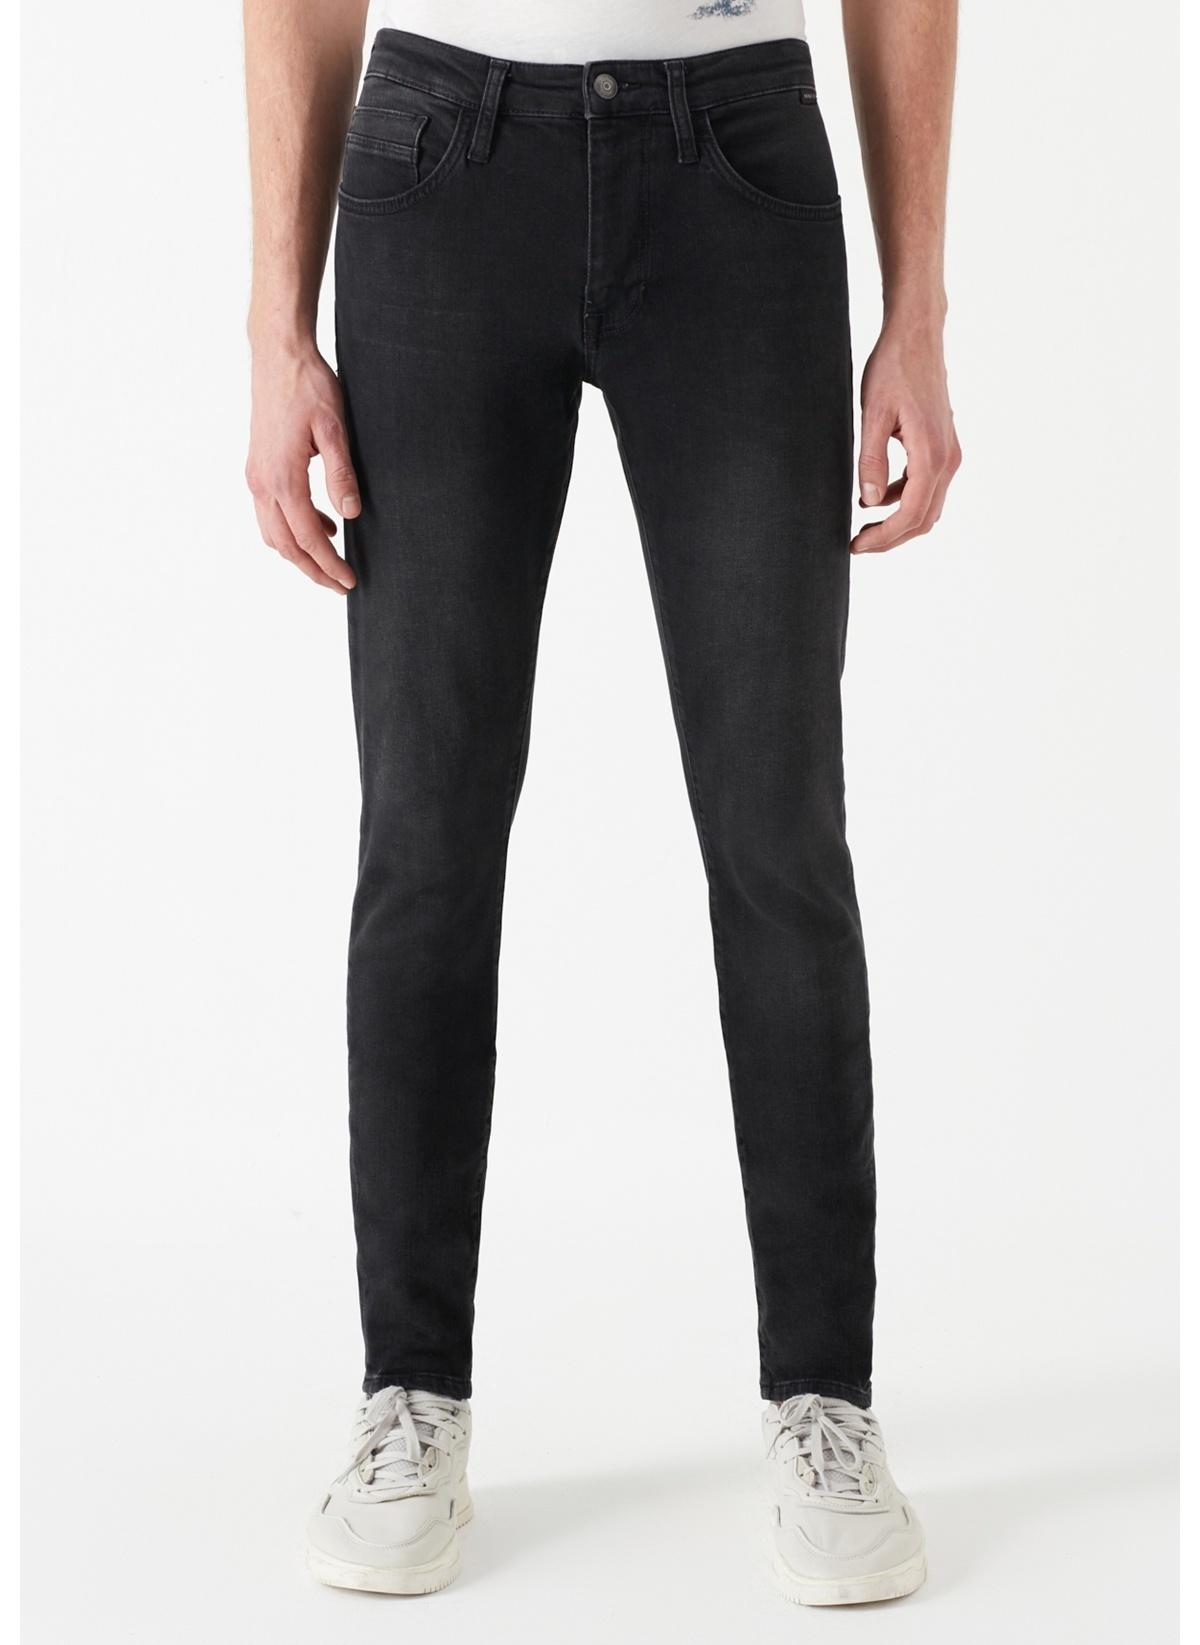 Mavi Jean Pantolon   Leo – Super Skinny 0076228604 Leo Gri Comfort Jean Pantolon – 159.99 TL